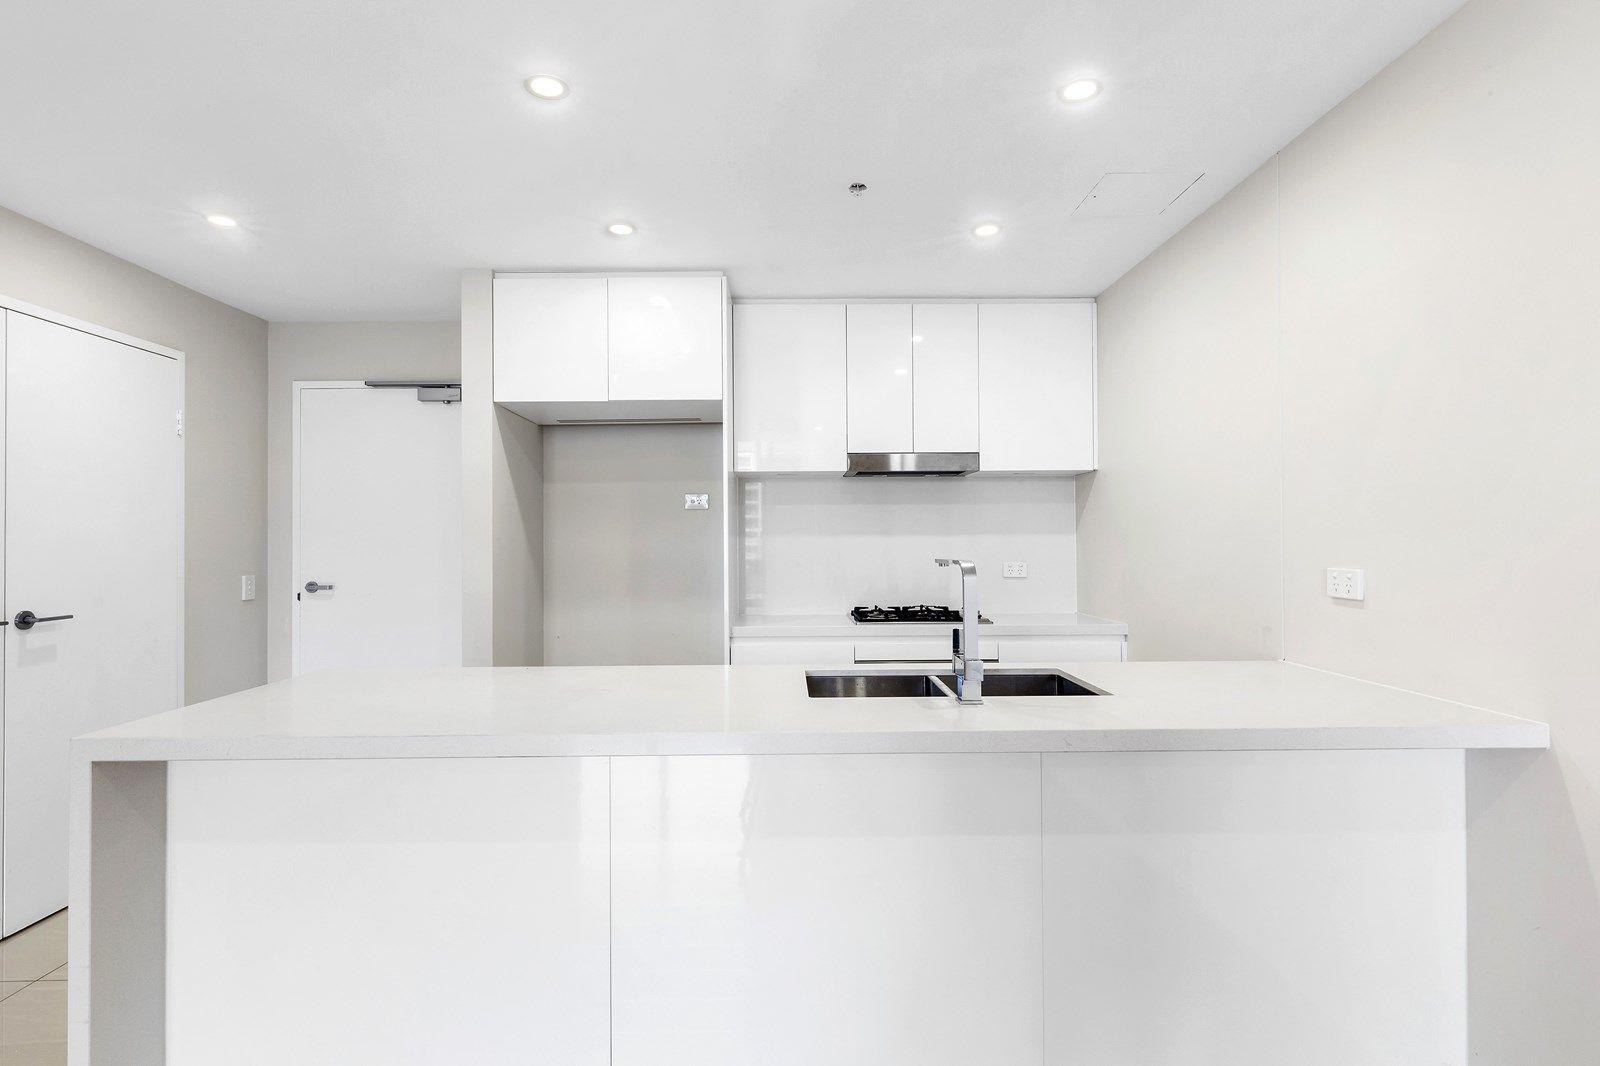 306/47-51 Crown Street, Wollongong NSW 2500, Image 1